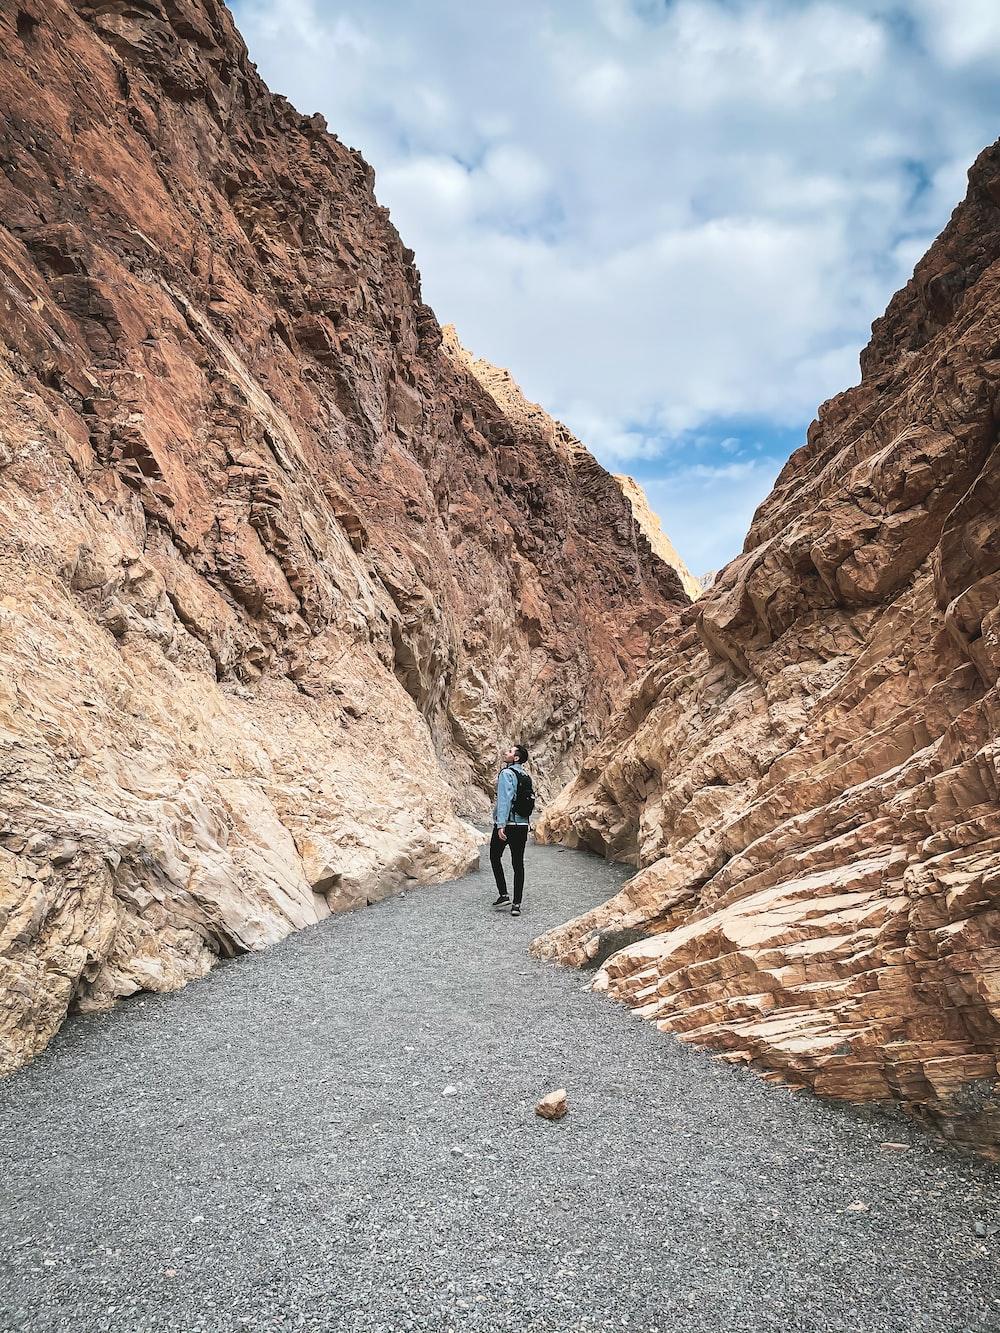 man in blue jacket walking on pathway between brown rock formation during daytime